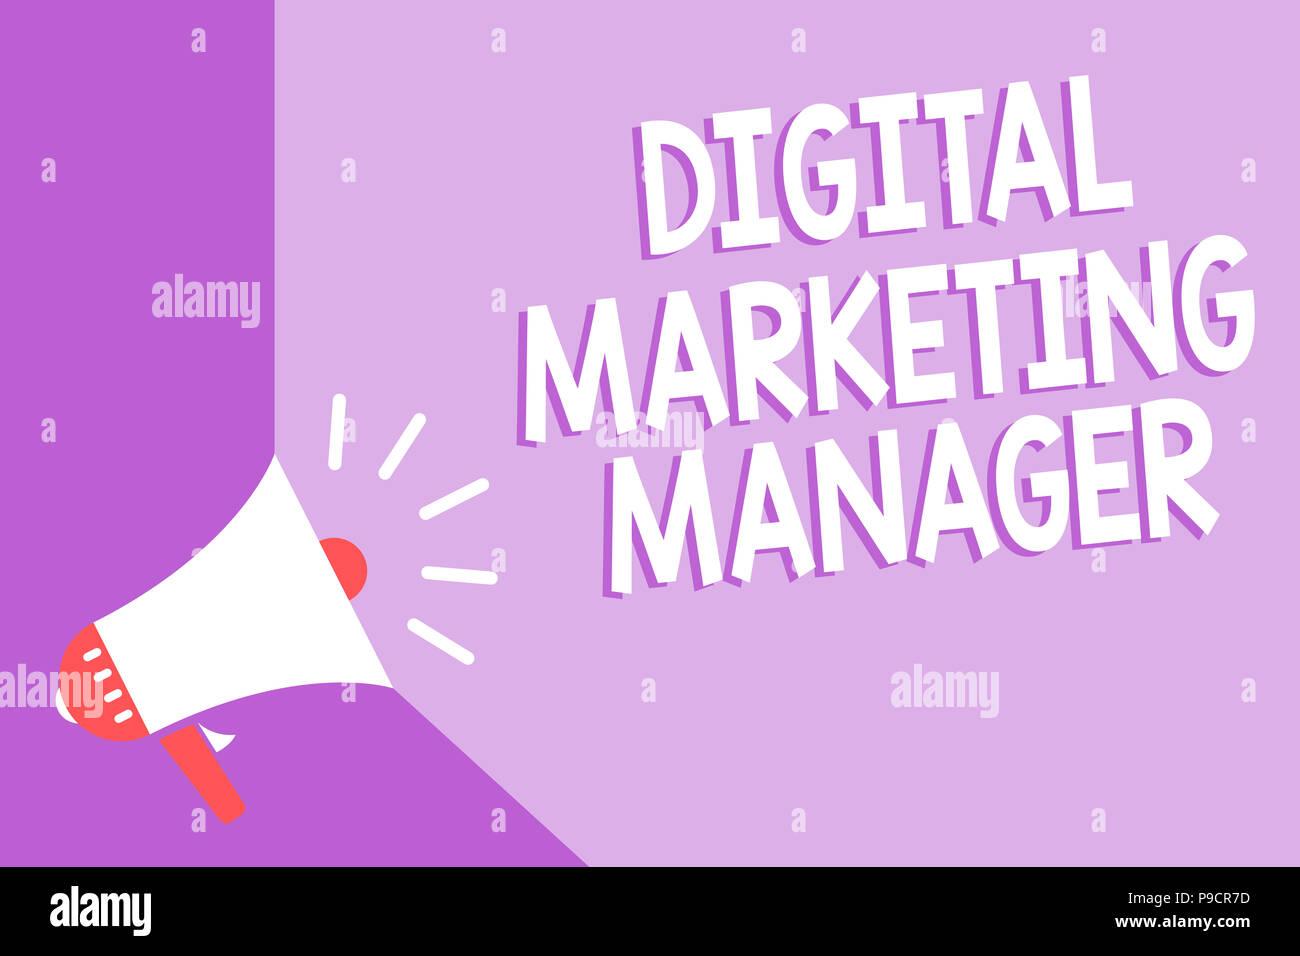 Word writing text Digital Marketing Manager. Business concept for optimized for posting in online boards or careers Megaphone loudspeaker purple backg - Stock Image